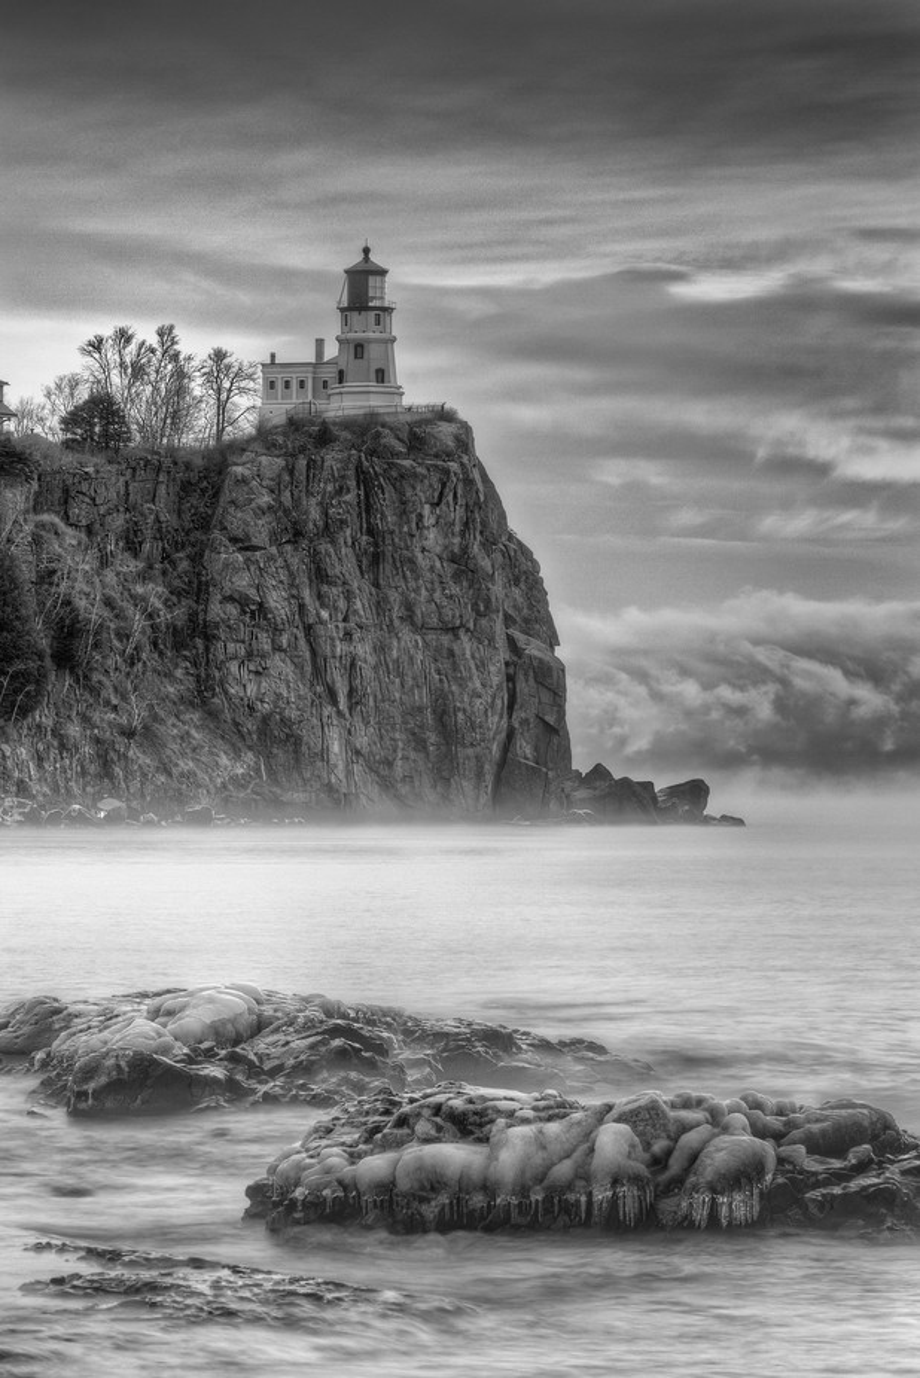 Splitrock Lighthouse by johnlatourelle - A Storm Is Coming Photo Contest